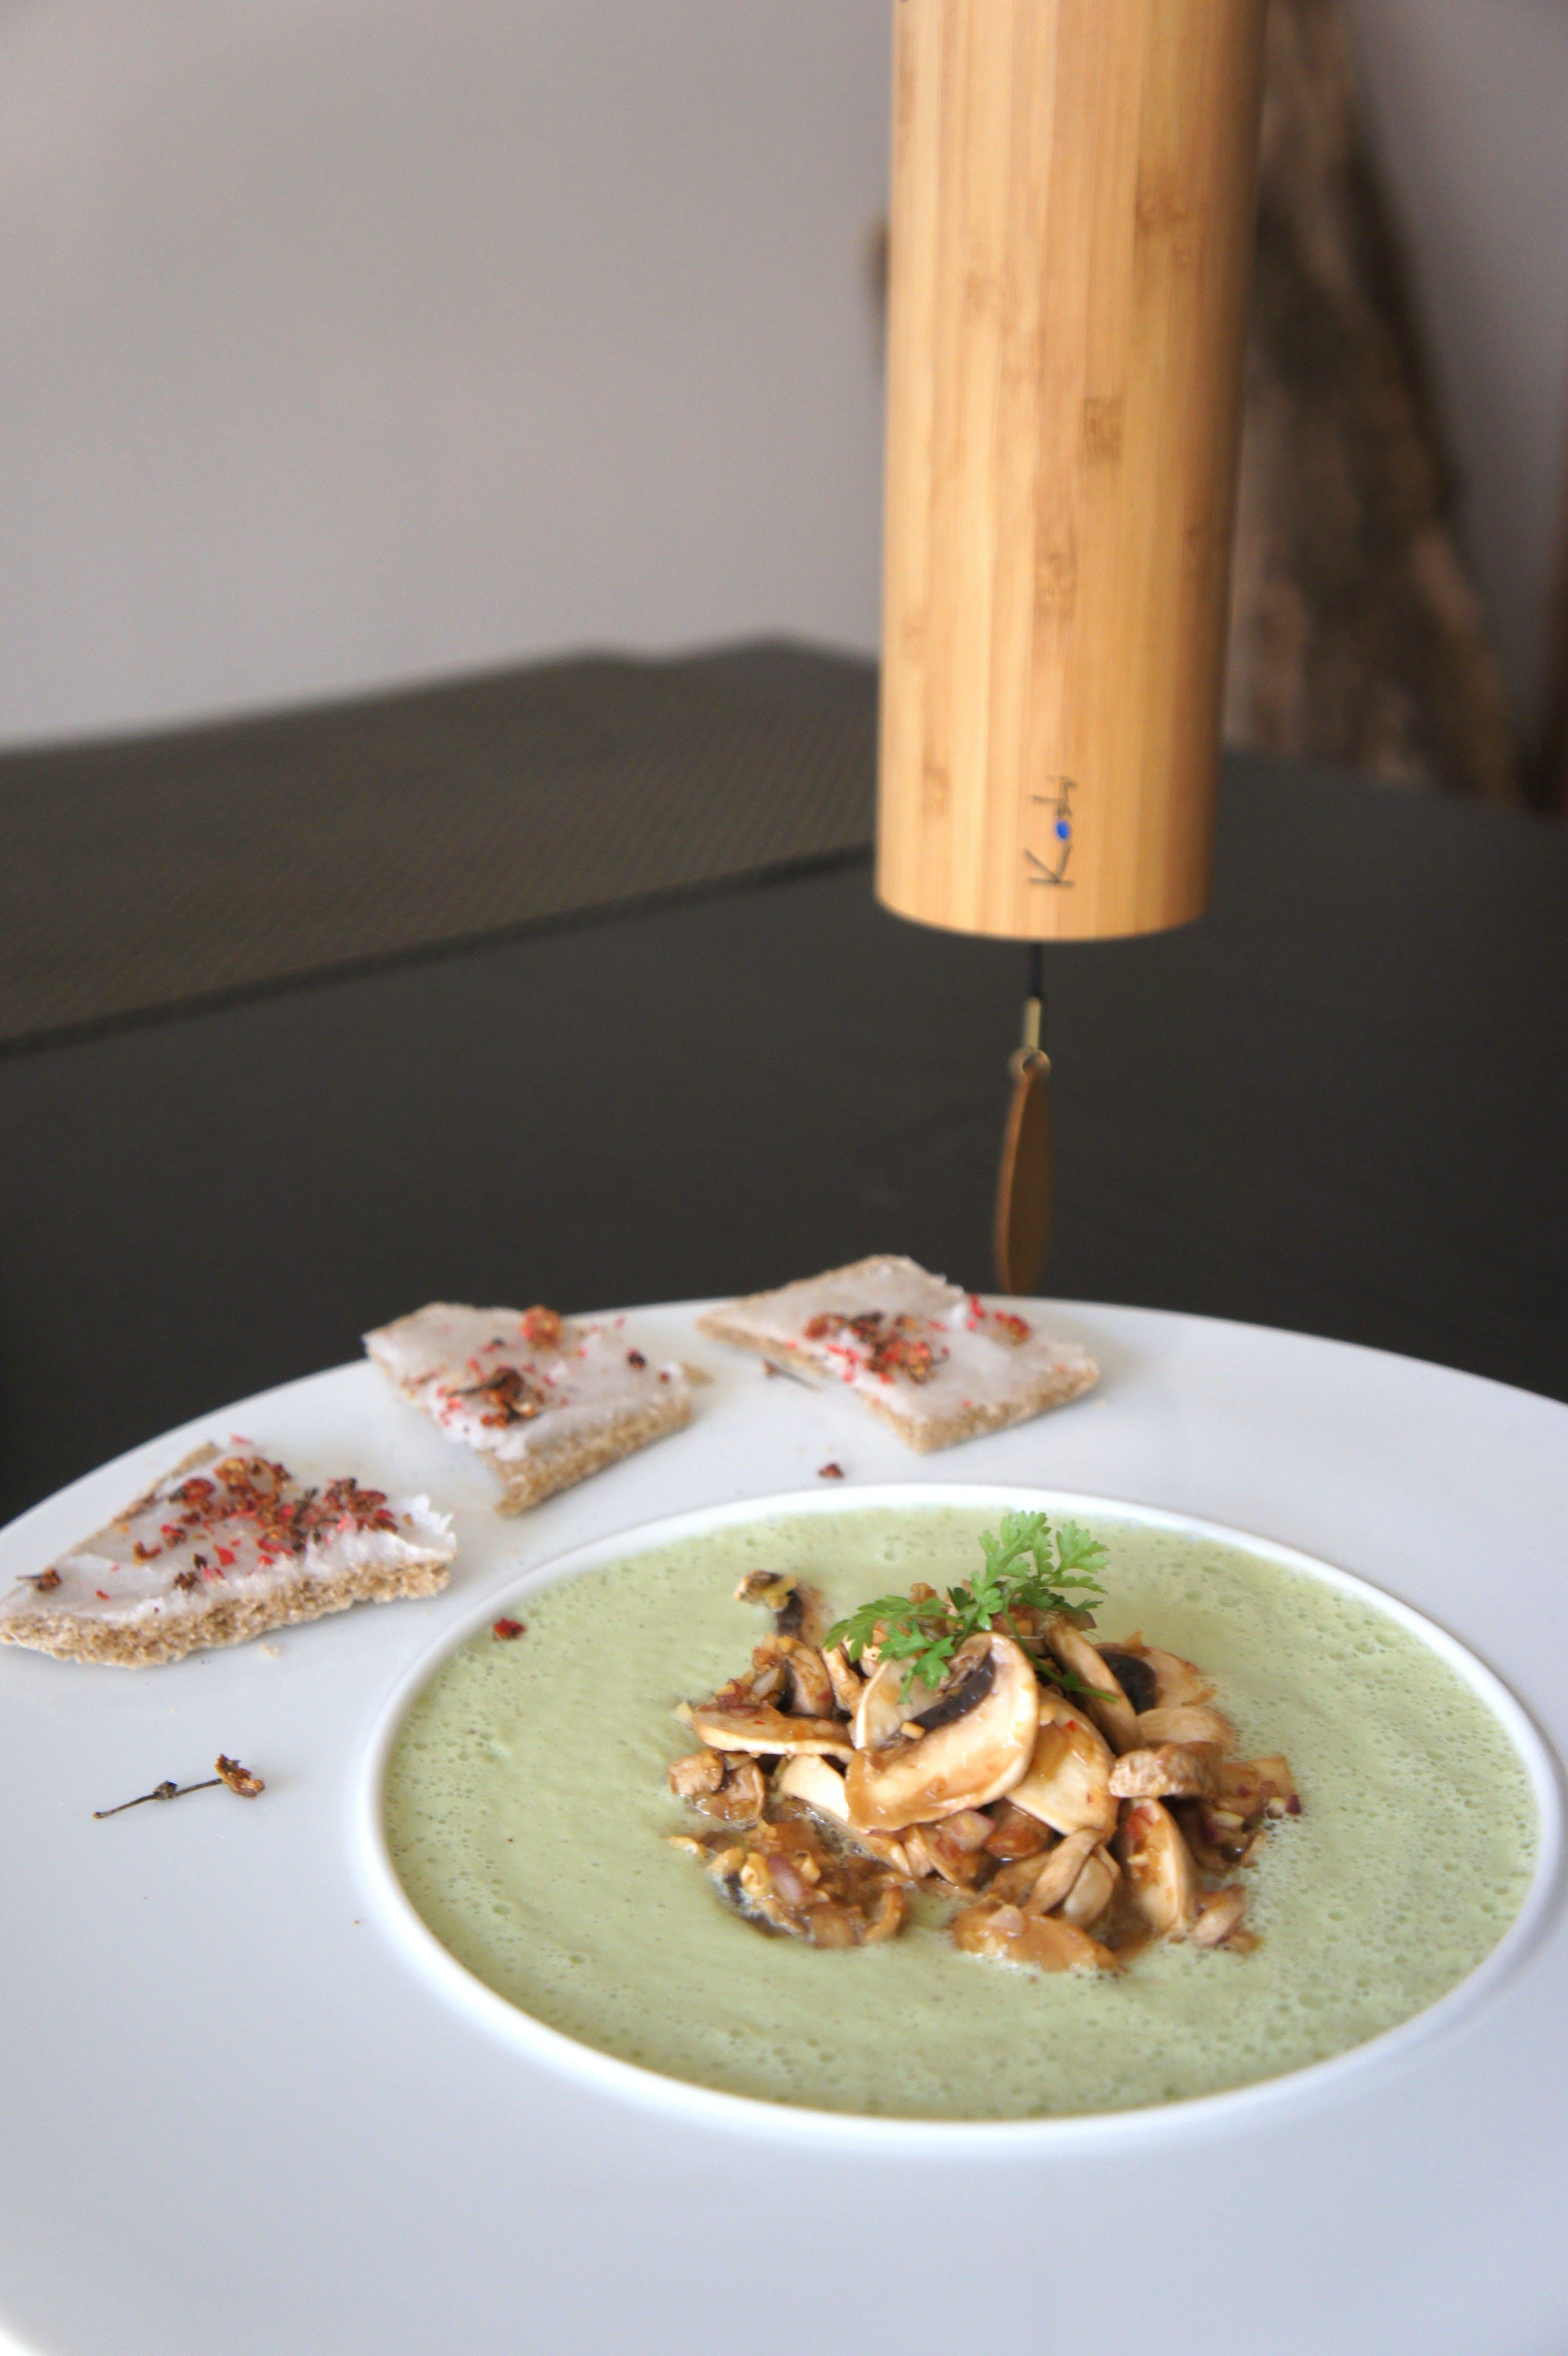 Fotos de stock gratuitas de beber, seta, sopa